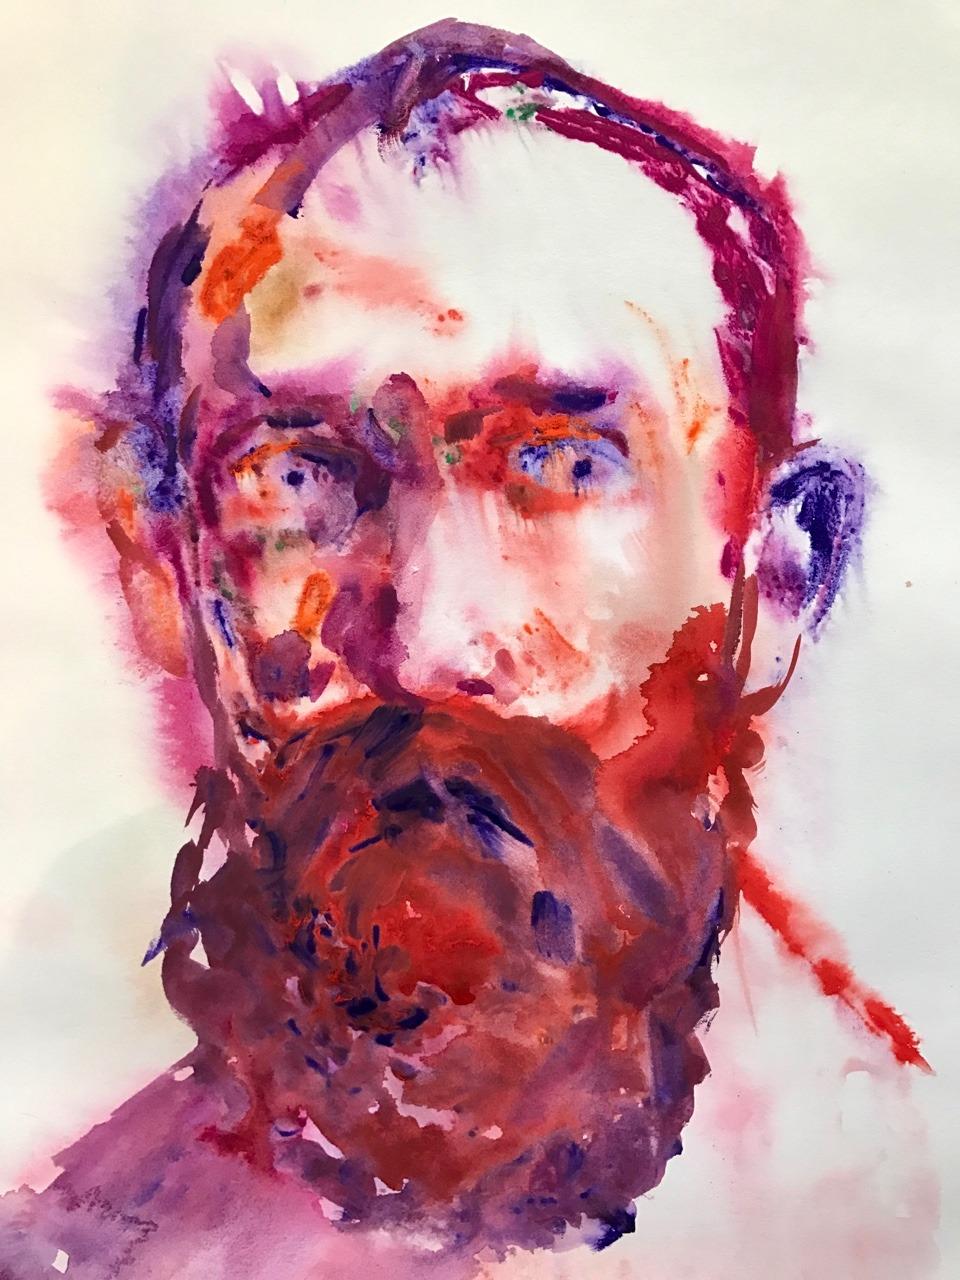 """Red"", 2017, monoprint, 22.5""x15"""